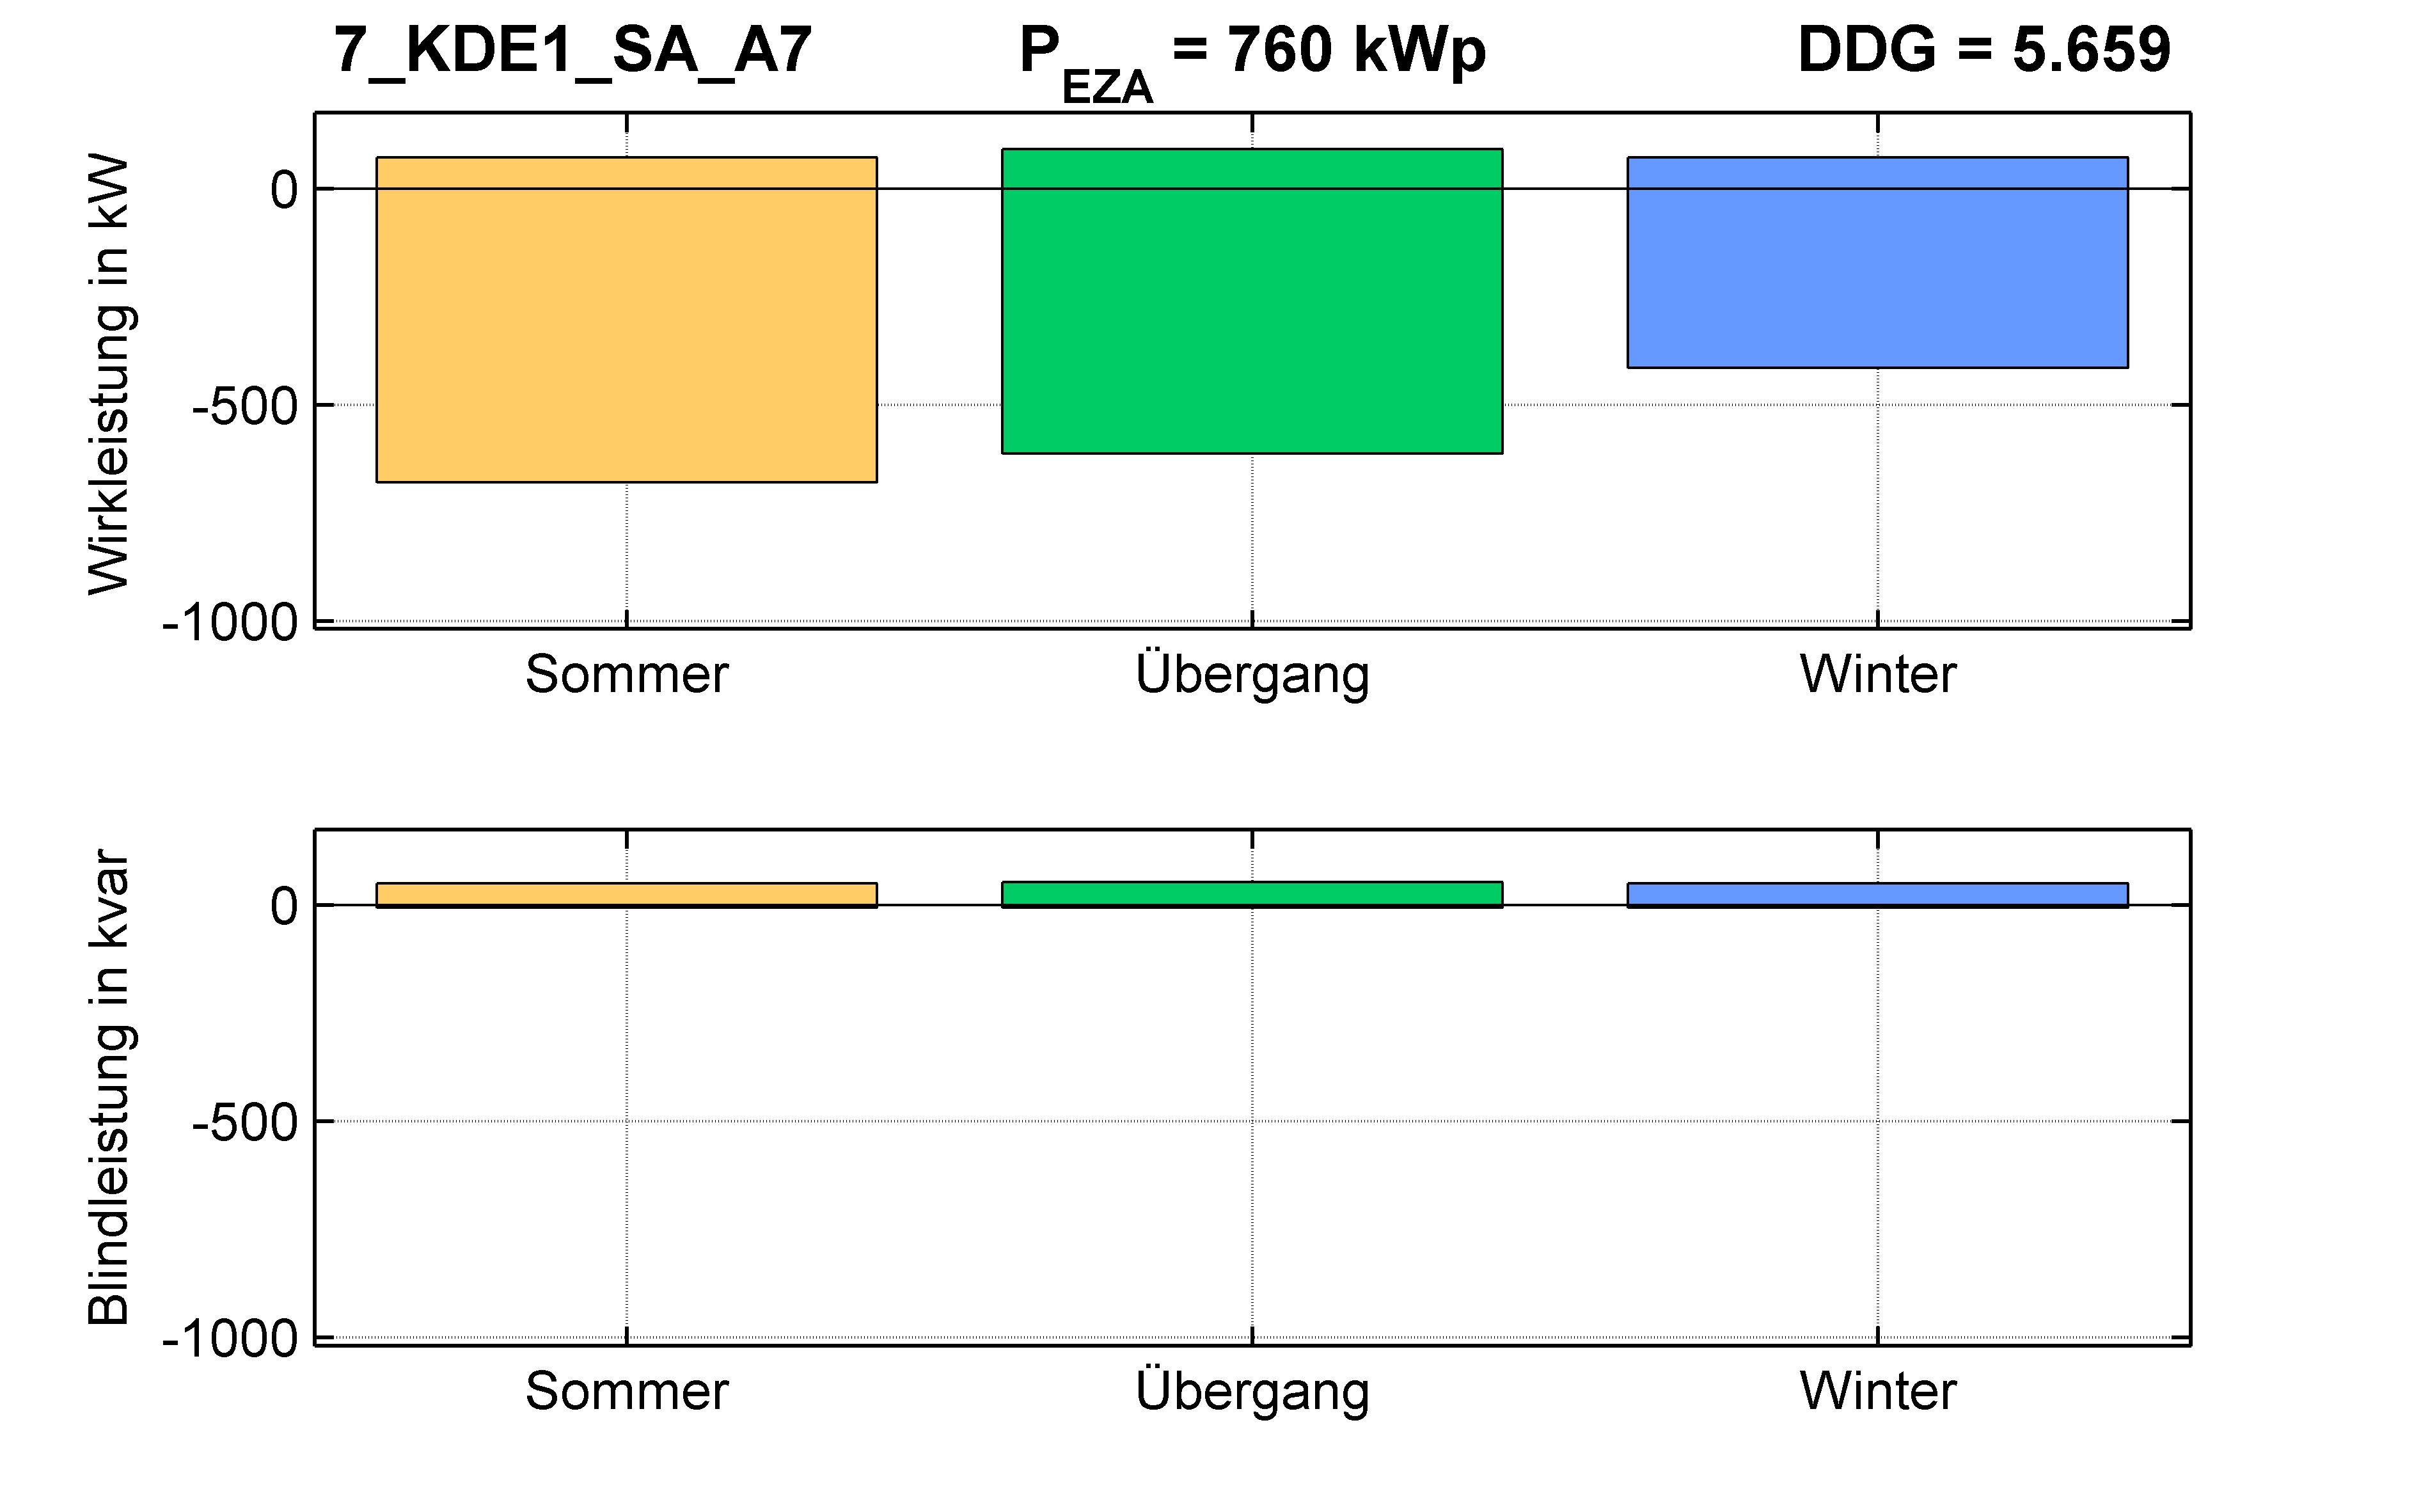 KDE1 | Längsregler (SA) A7 | PQ-Bilanz